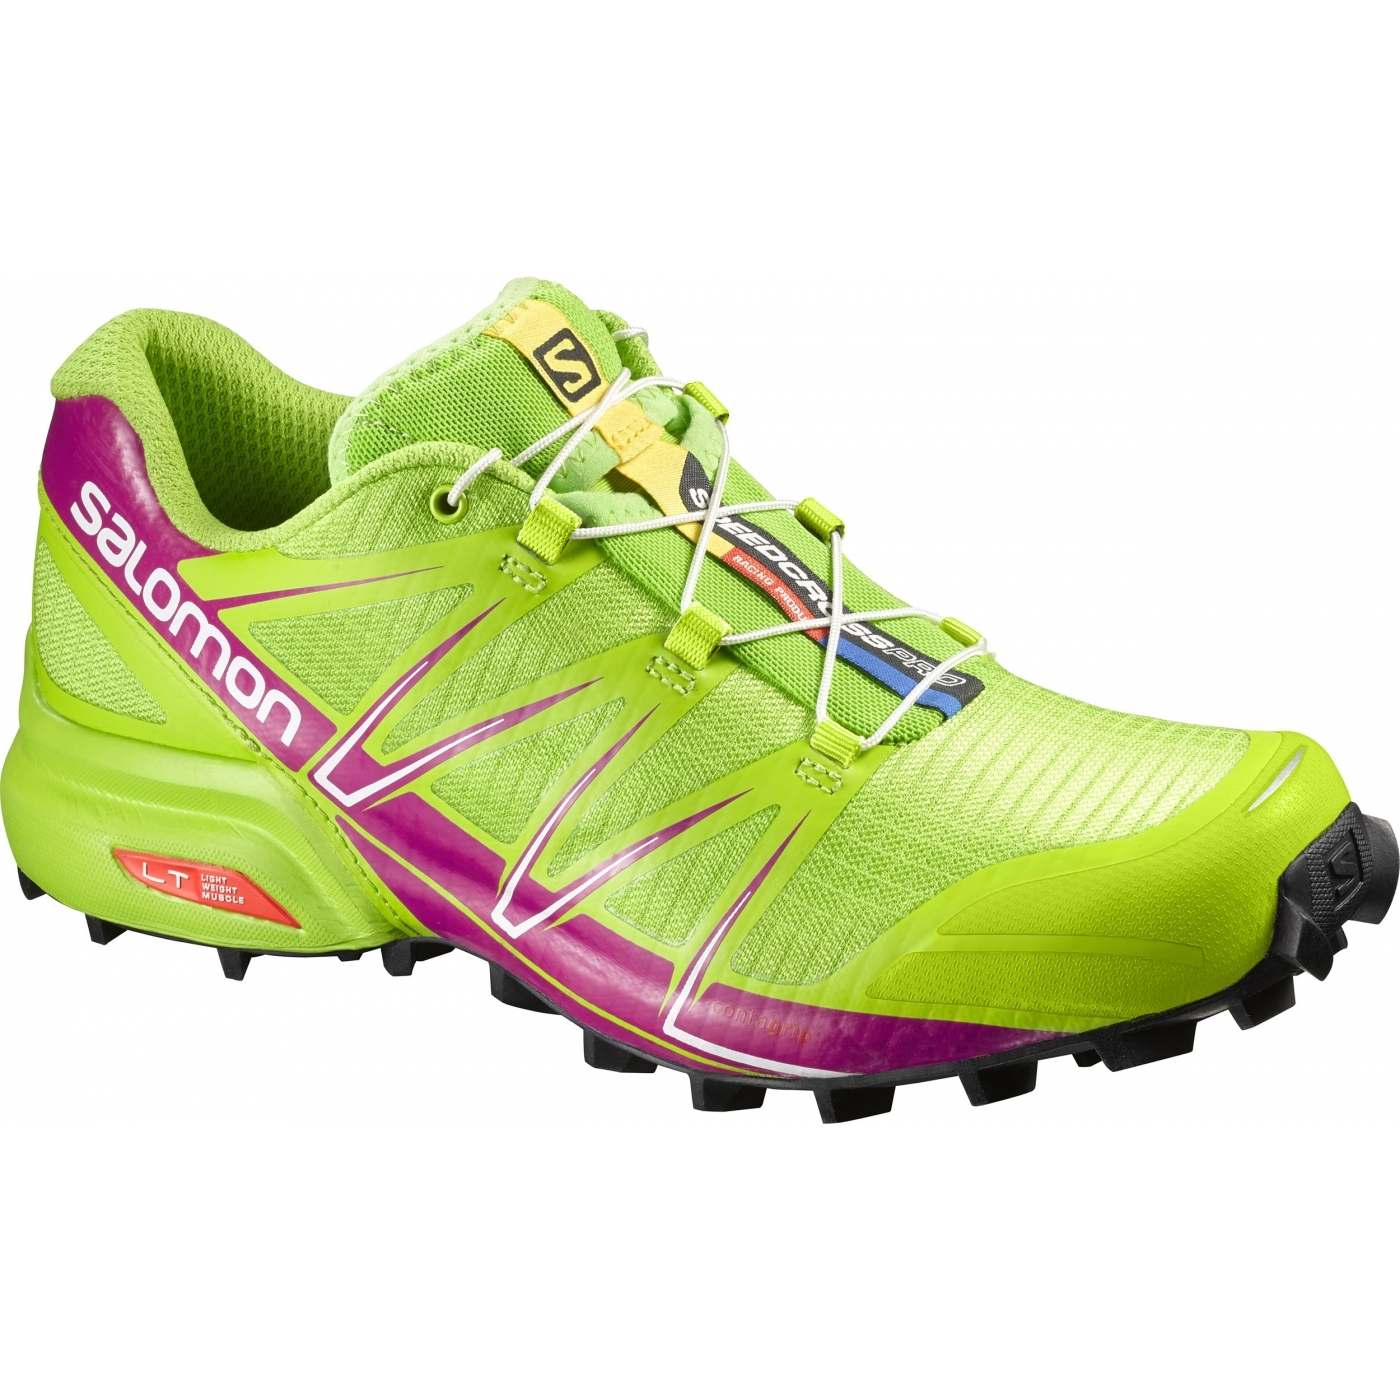 Salomon Speedcross Pro, Chaussures de Tr